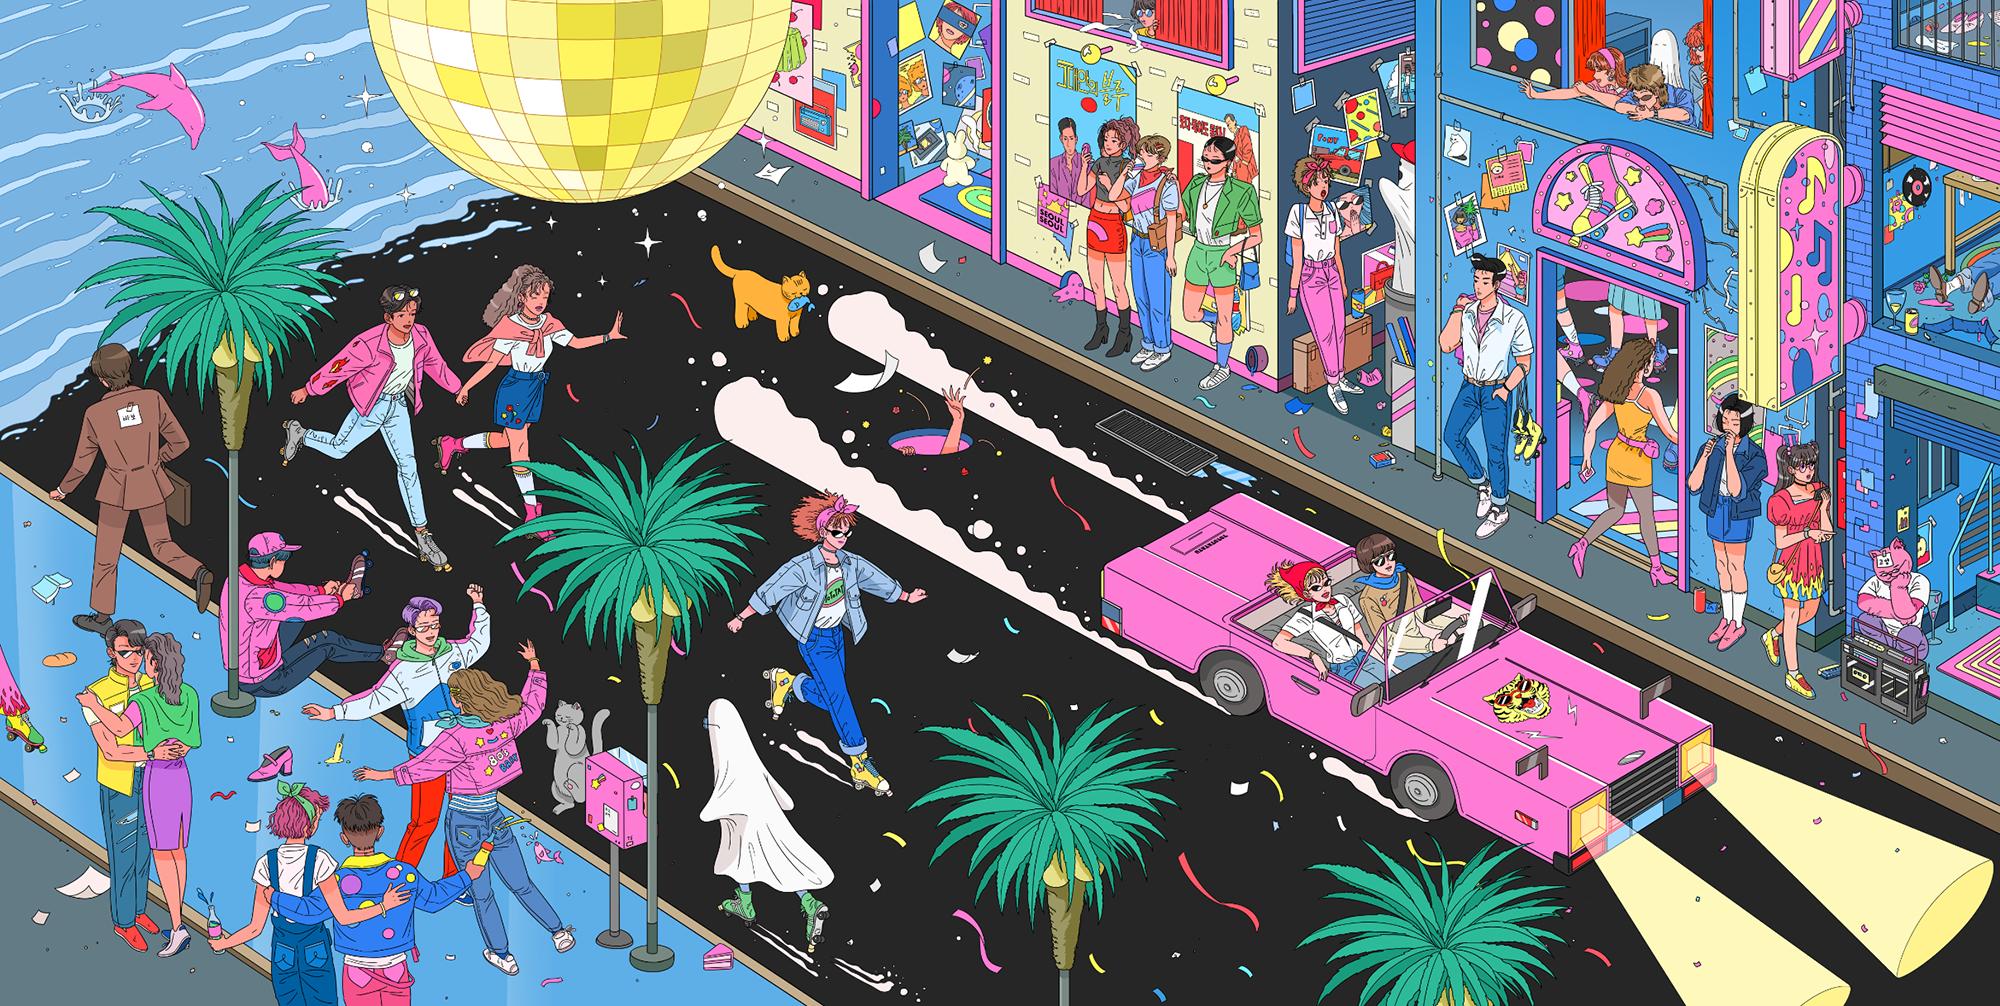 GirlsclubAsia-Illustrator-Seoyoung-tototatatu-2